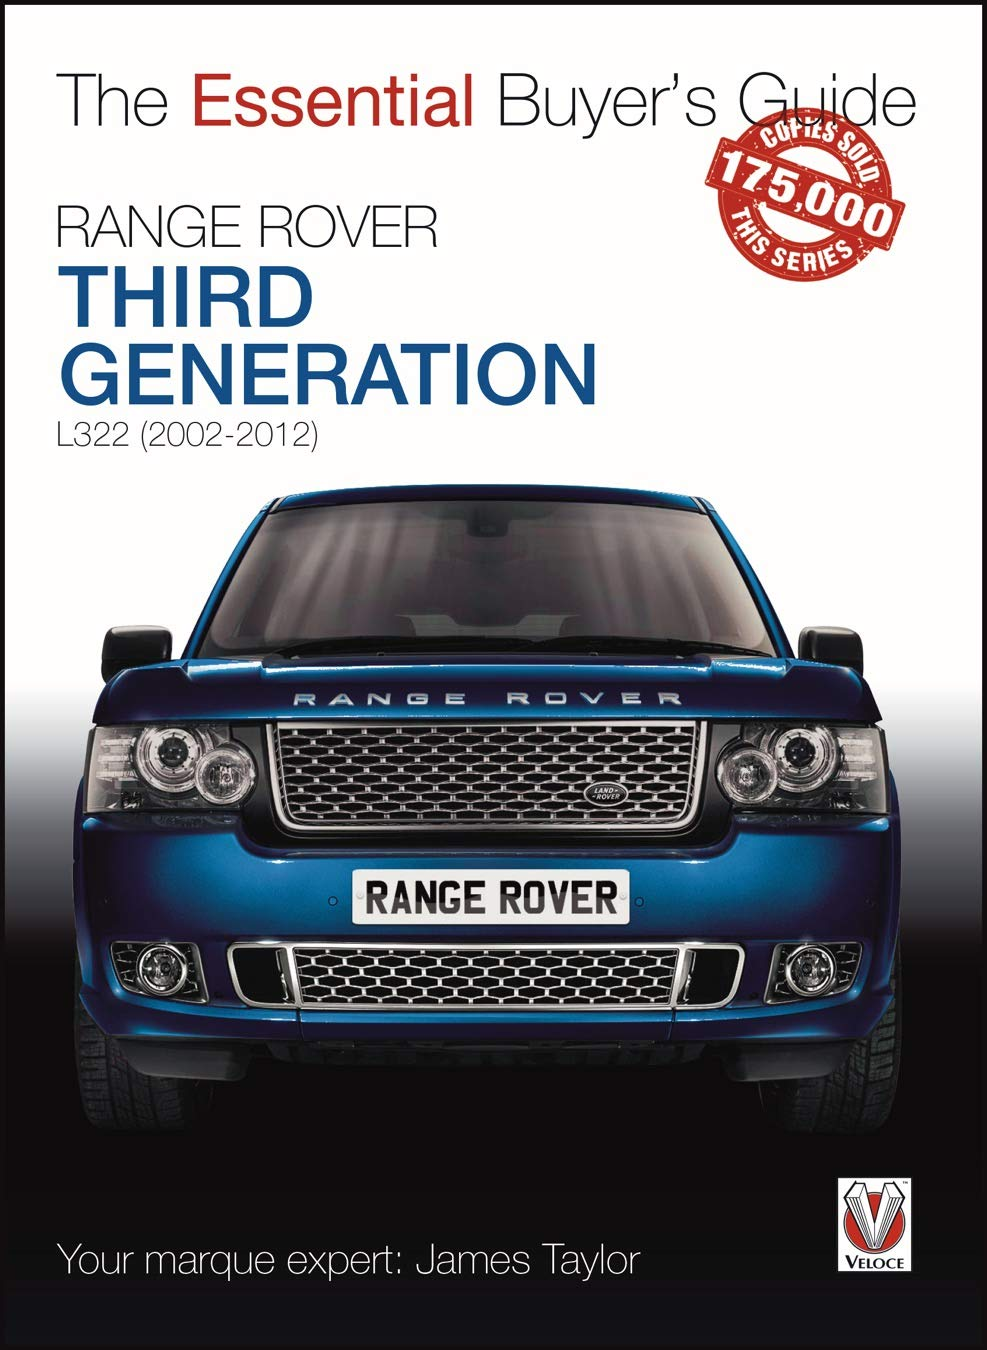 Range Rover  Third Generation L322  2002 2012   Essential Buyer's Guide